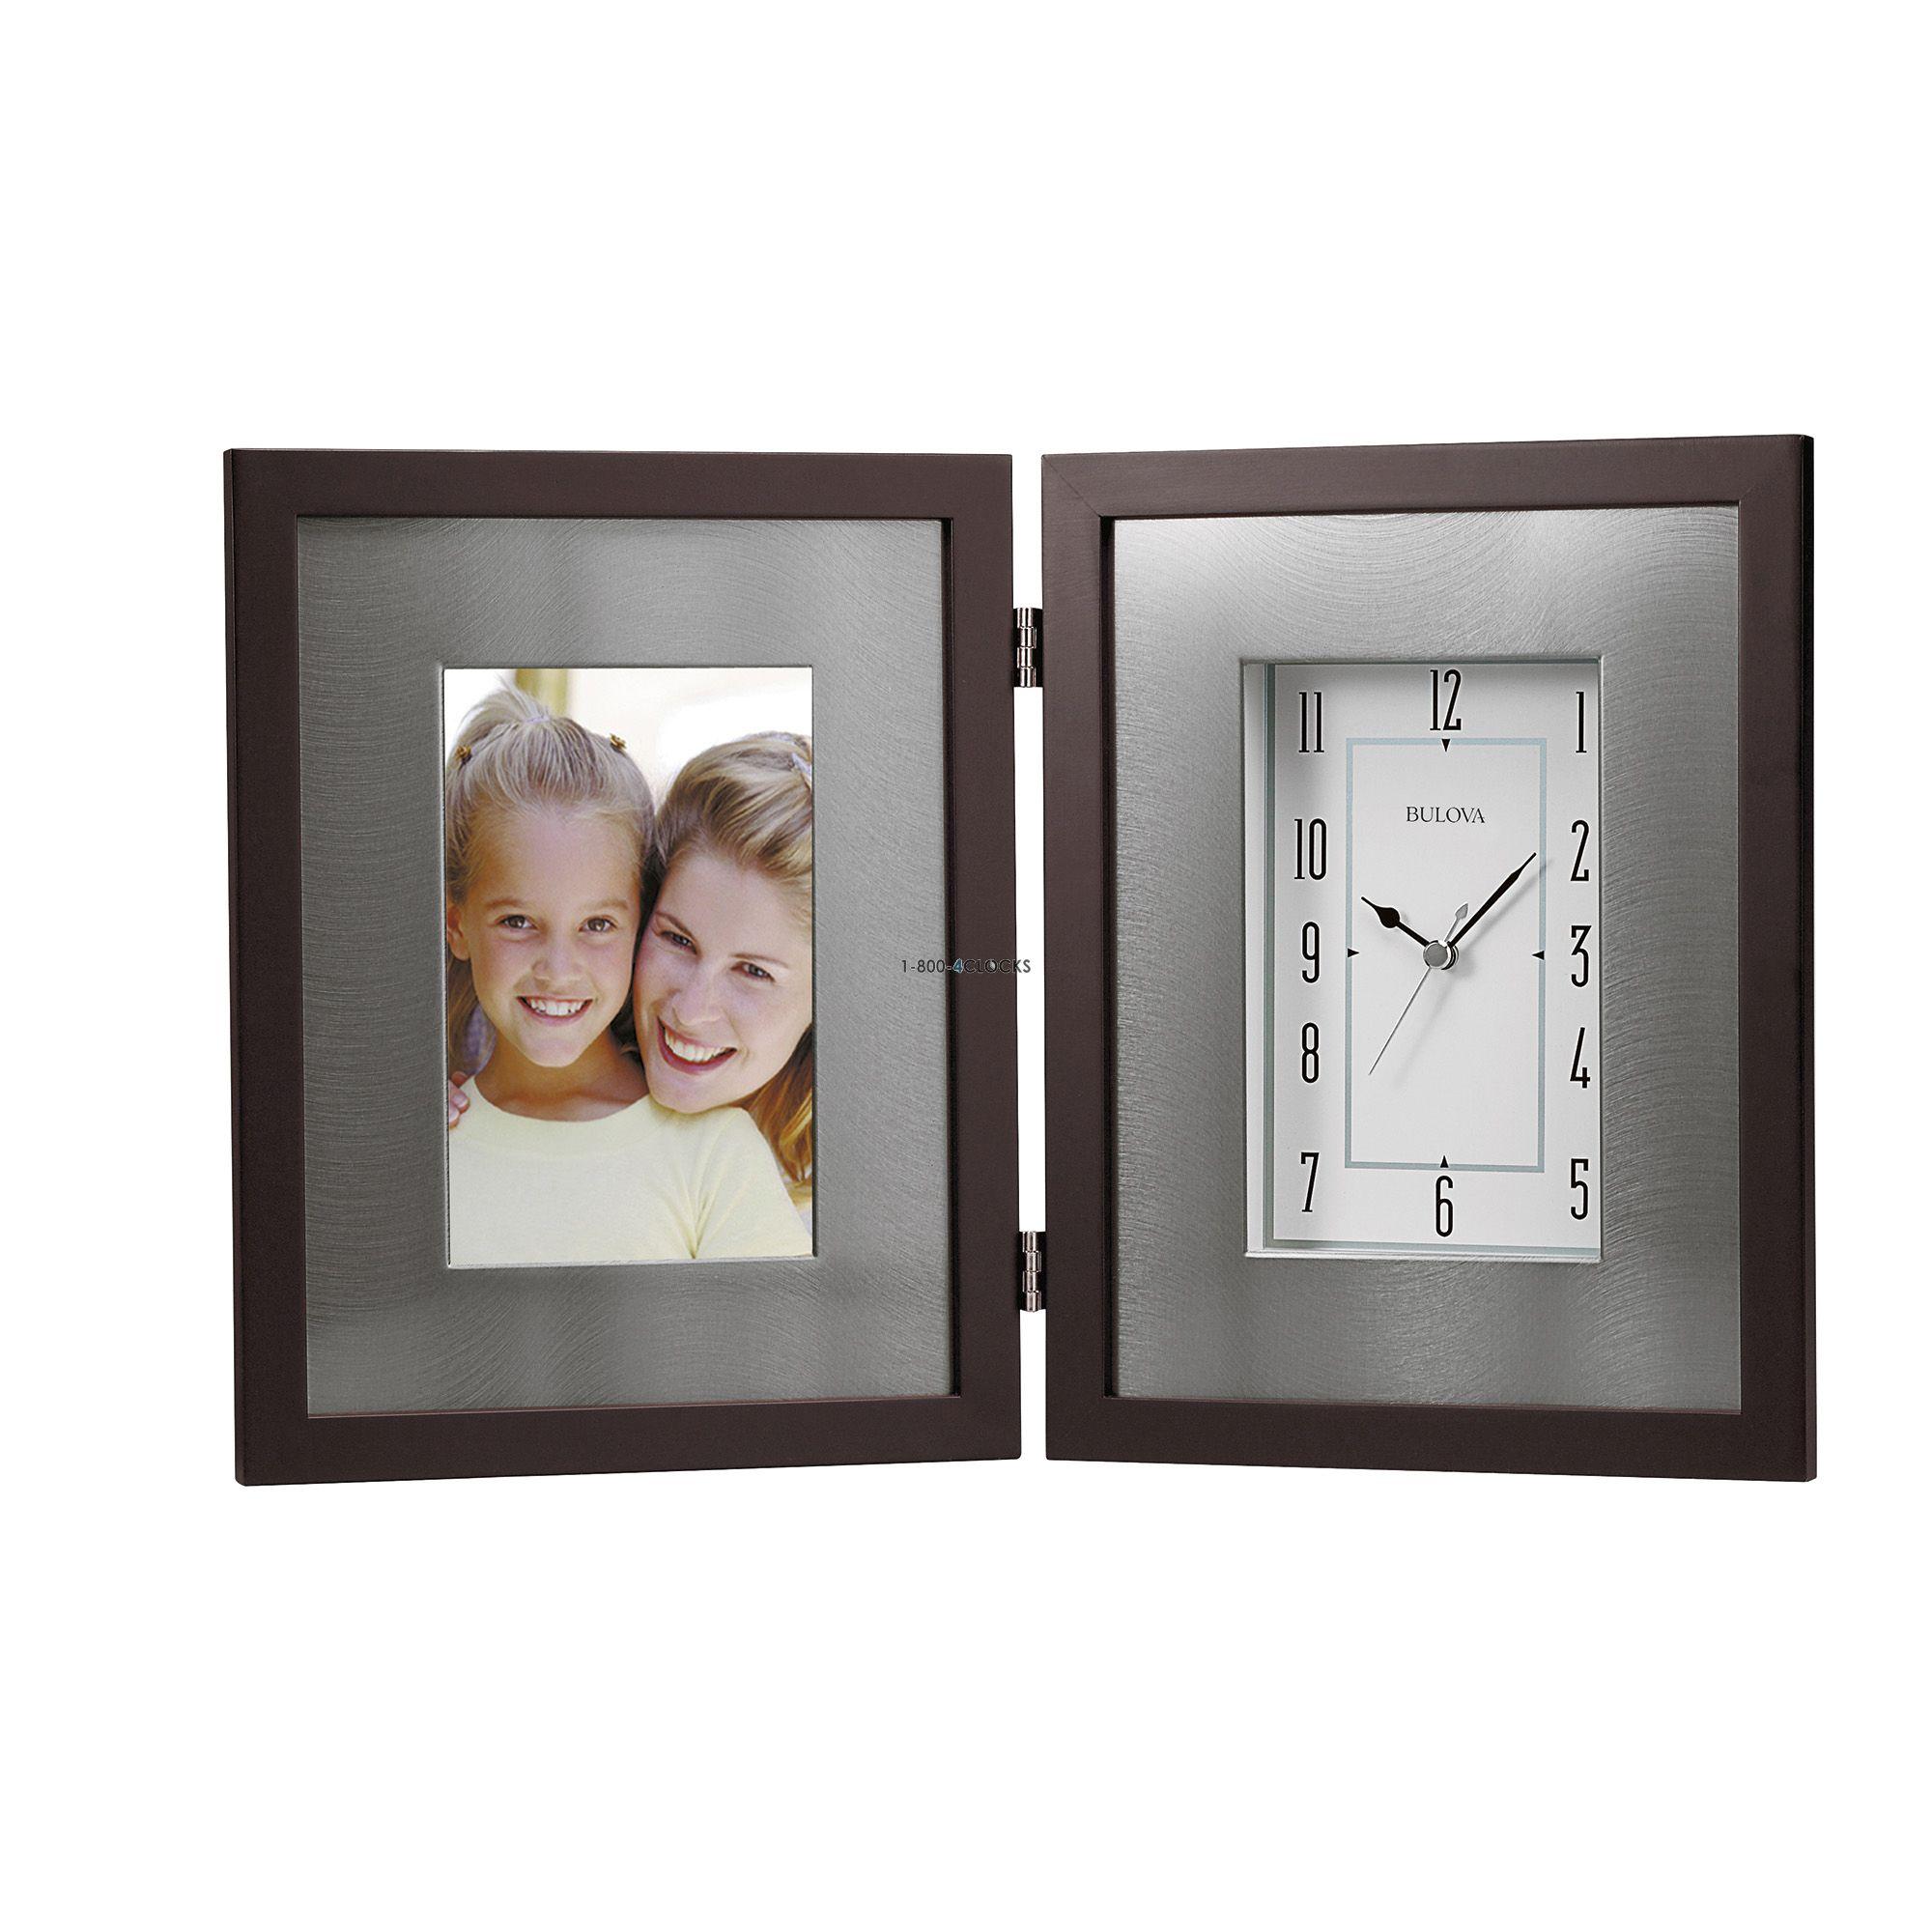 Bulova Winfield Photo Desk Clock At 1 800 4clocks Com